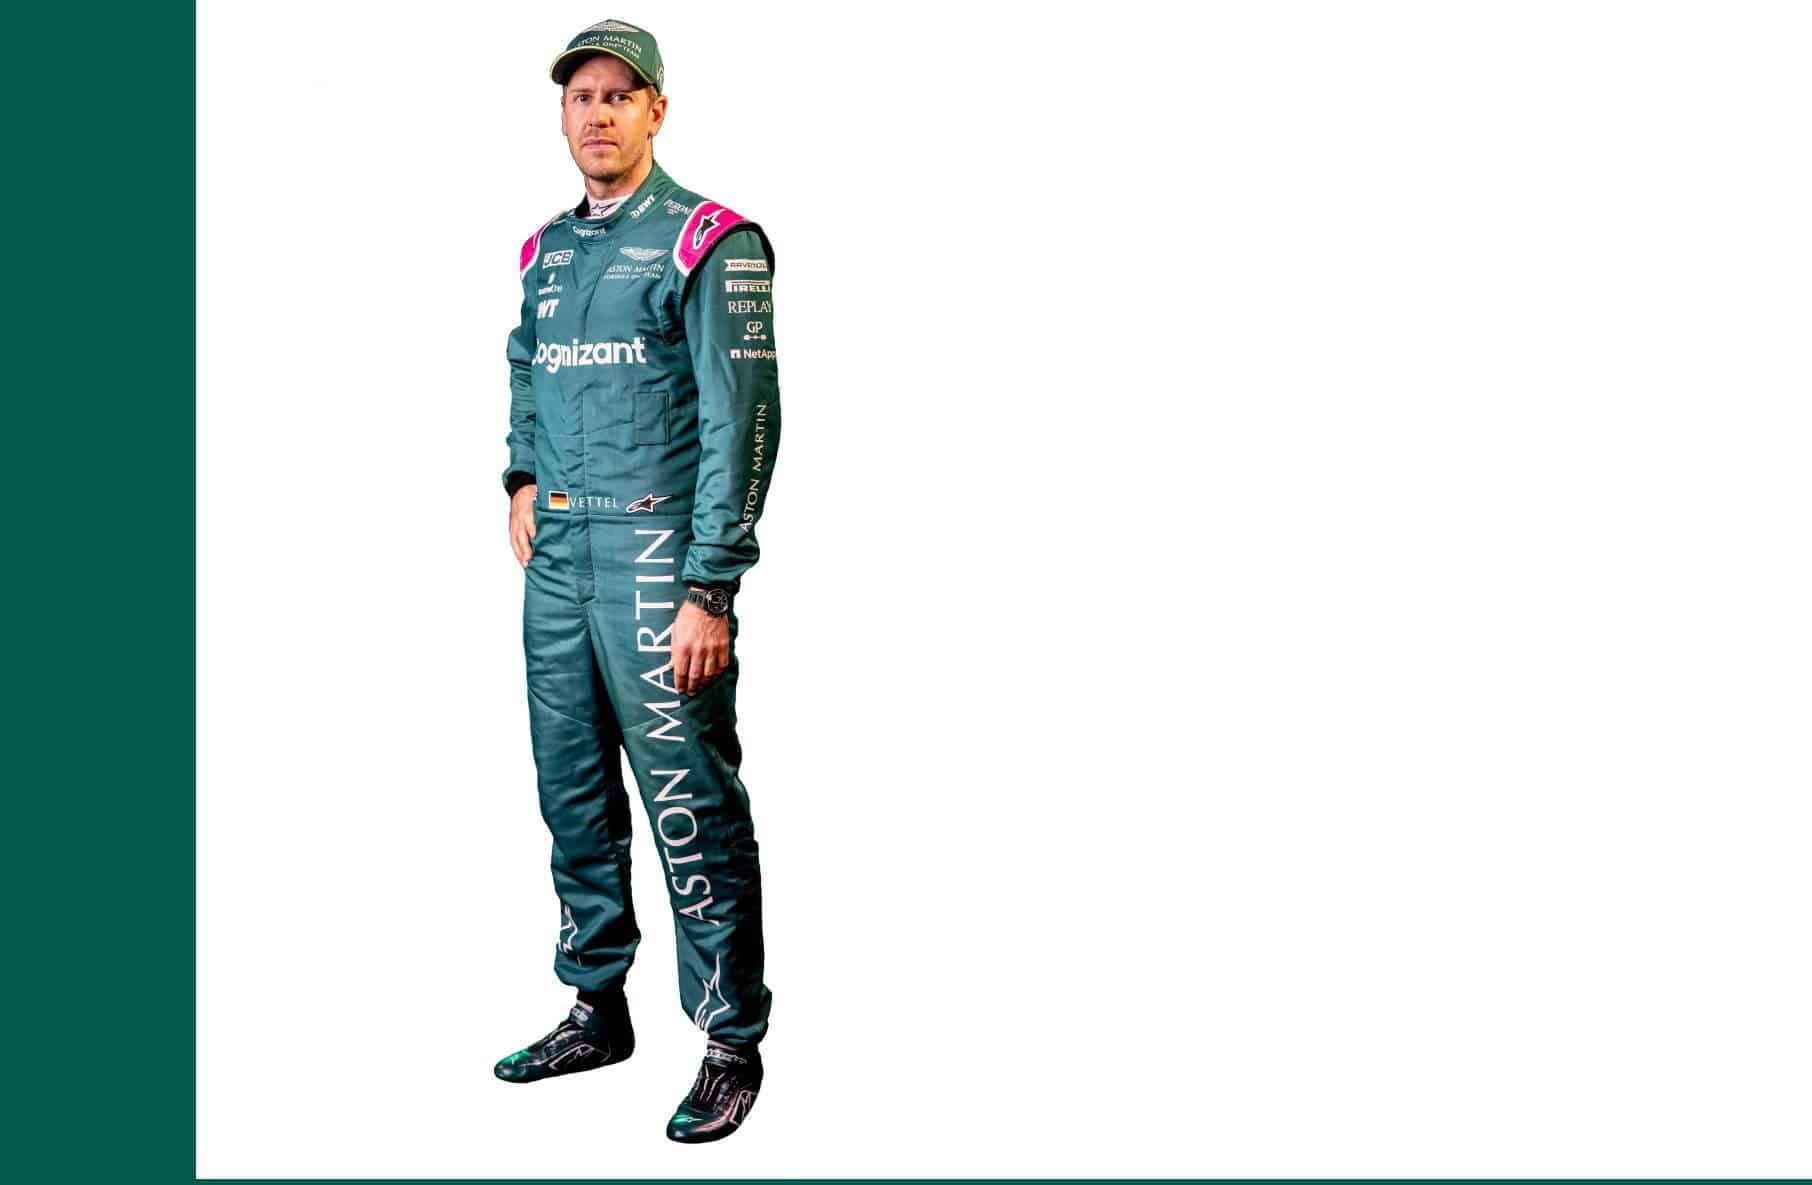 Sebastian Vettel F1 2021 profile picture full size white Photo Aston Martin Edited by MAXF1net